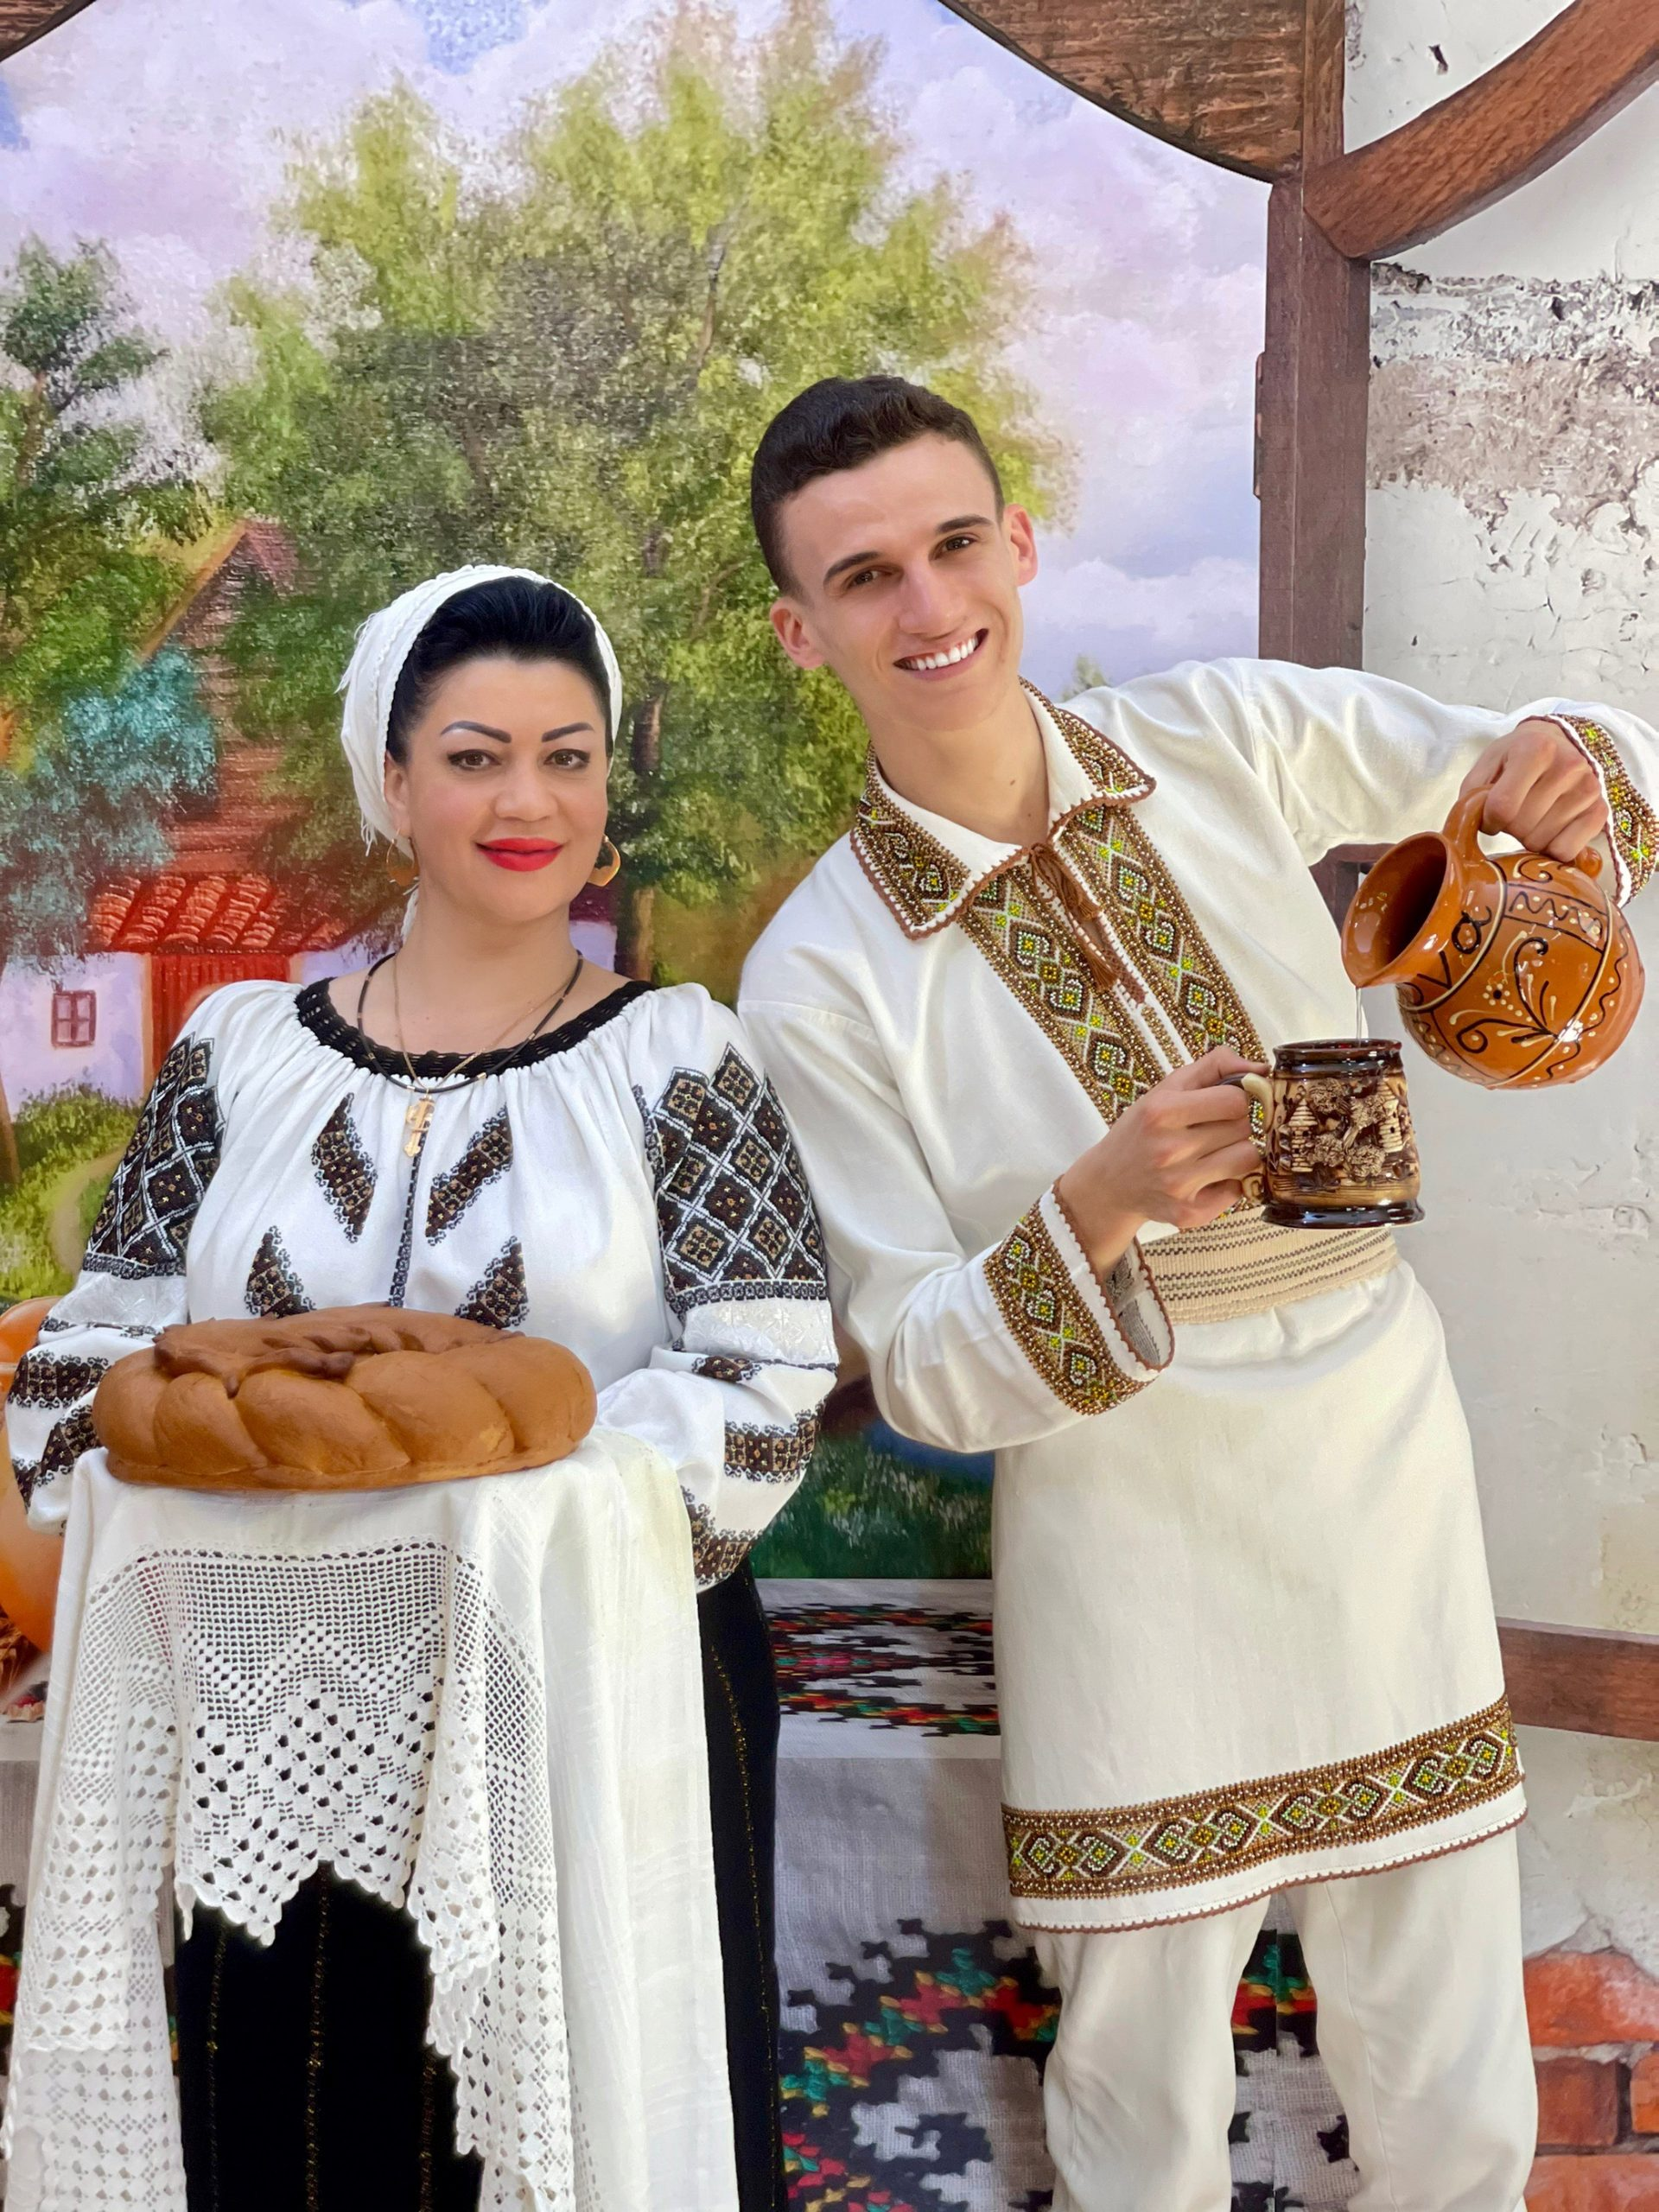 """𝗣𝗼𝗳𝘁𝗶𝗺 𝗹𝗮 𝗡𝗼𝗶"" 𝗰𝘂 𝗗𝗼𝗶𝗻𝗮 ș𝗶 𝗡𝗲𝗕𝘂𝗻𝘂 – Liliana Prado, Adrian Ursu, Ioana Căpraru și Vladimir Serbușca"